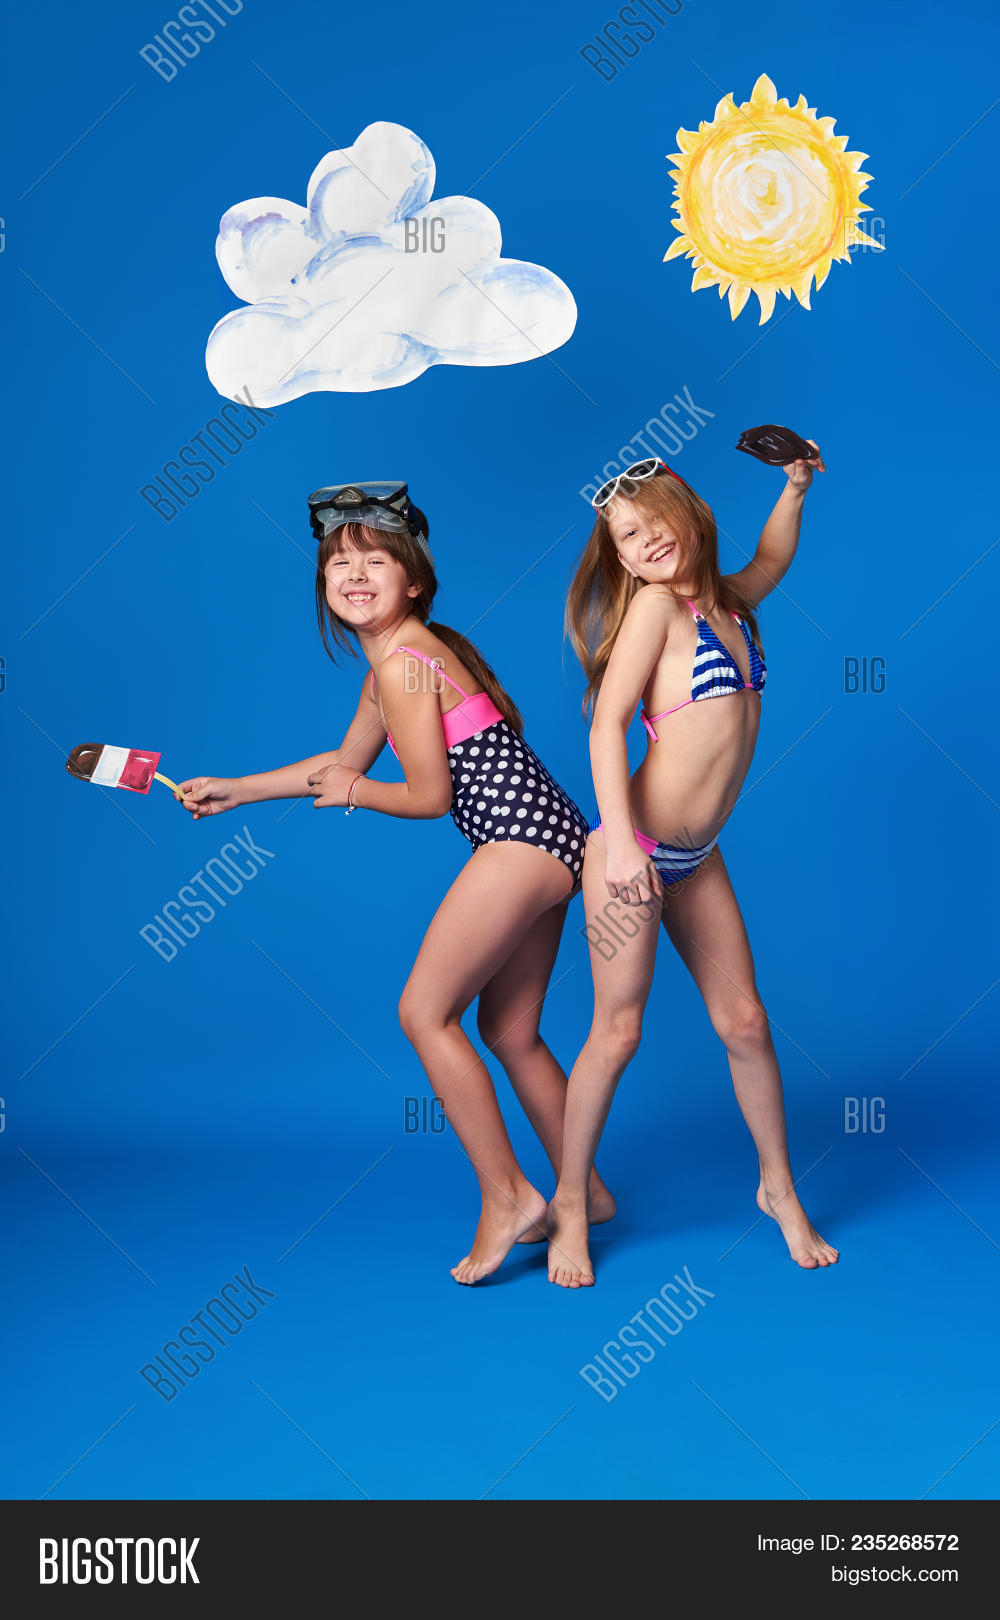 Comfort! Excuse, funny bikini model pictures free